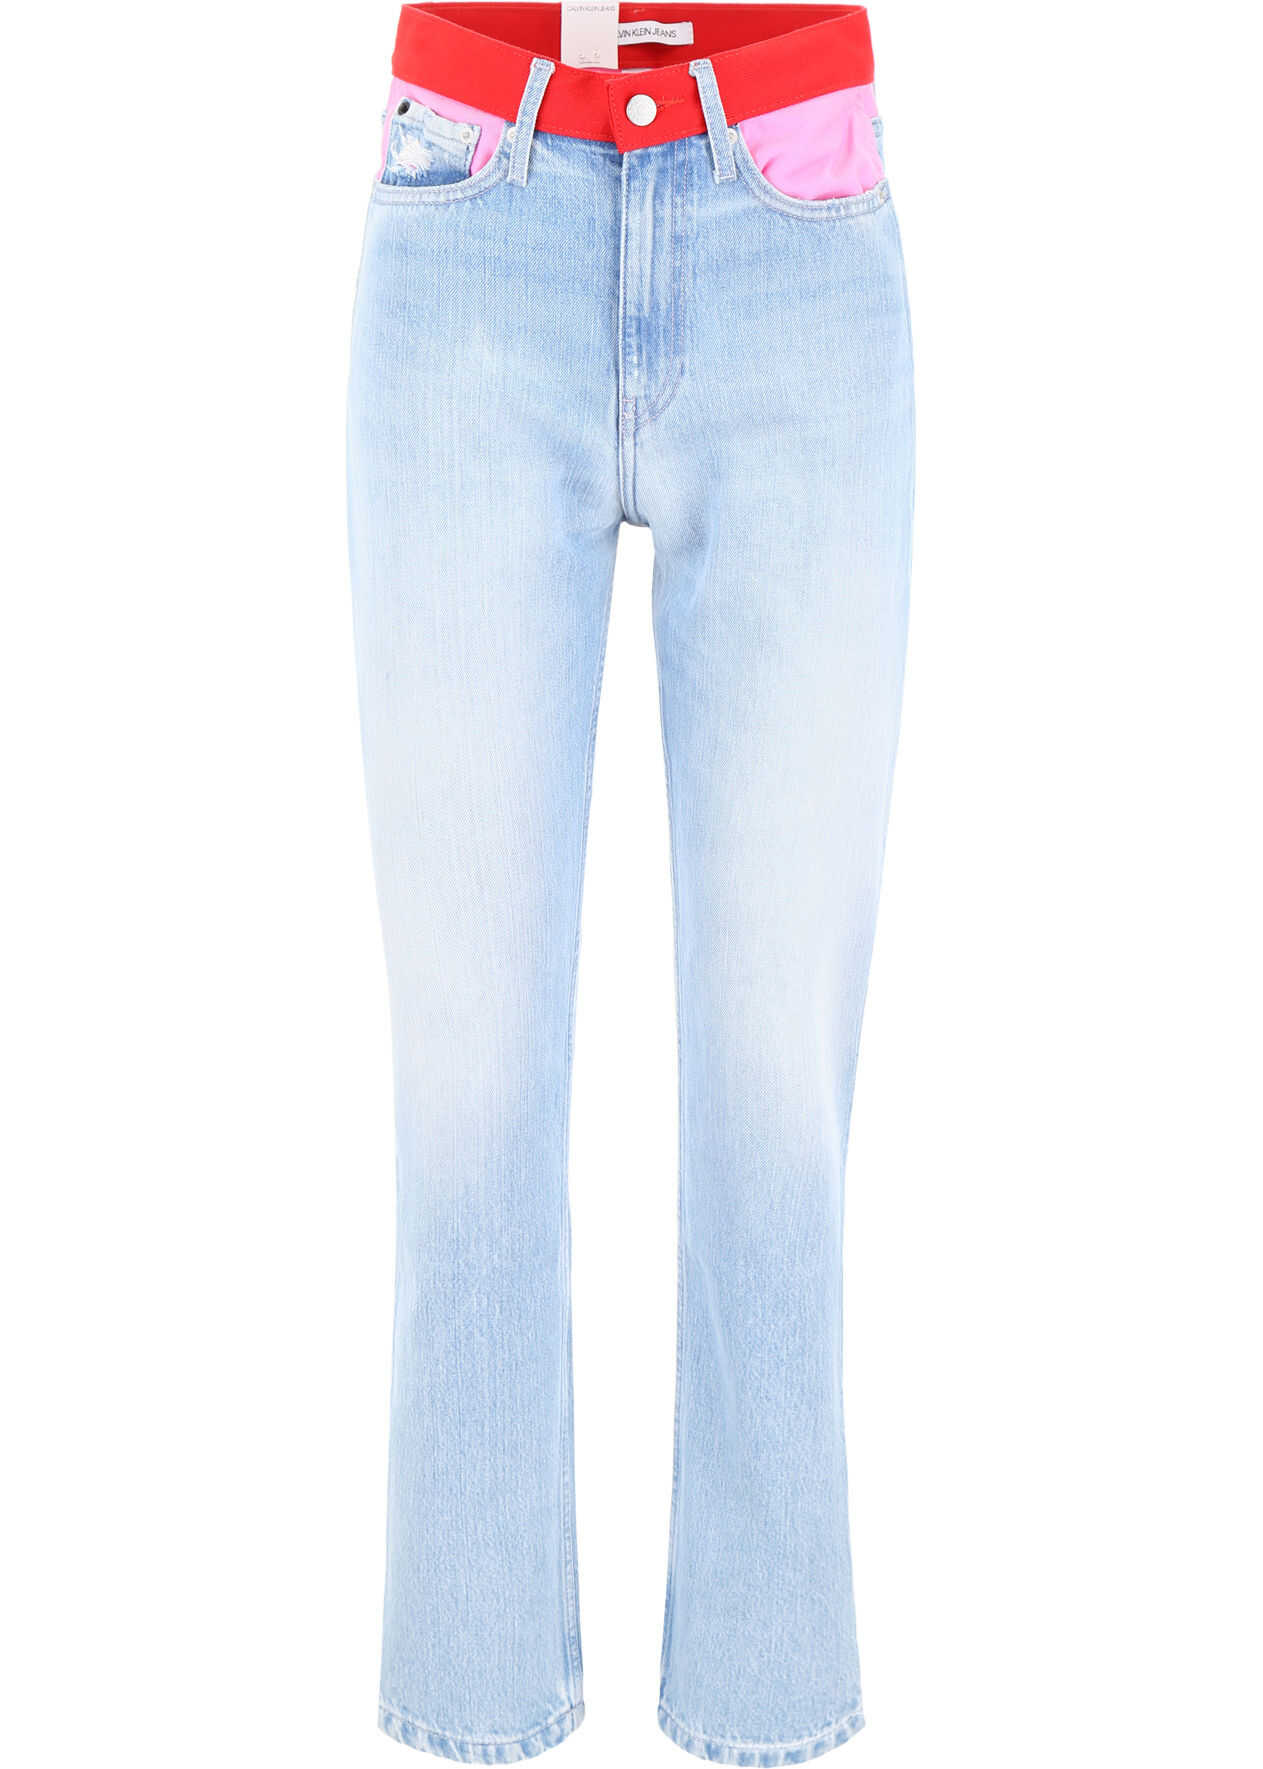 Calvin Klein Jeans Ckj 030 Jeans LIGHT BLUE PINK RED